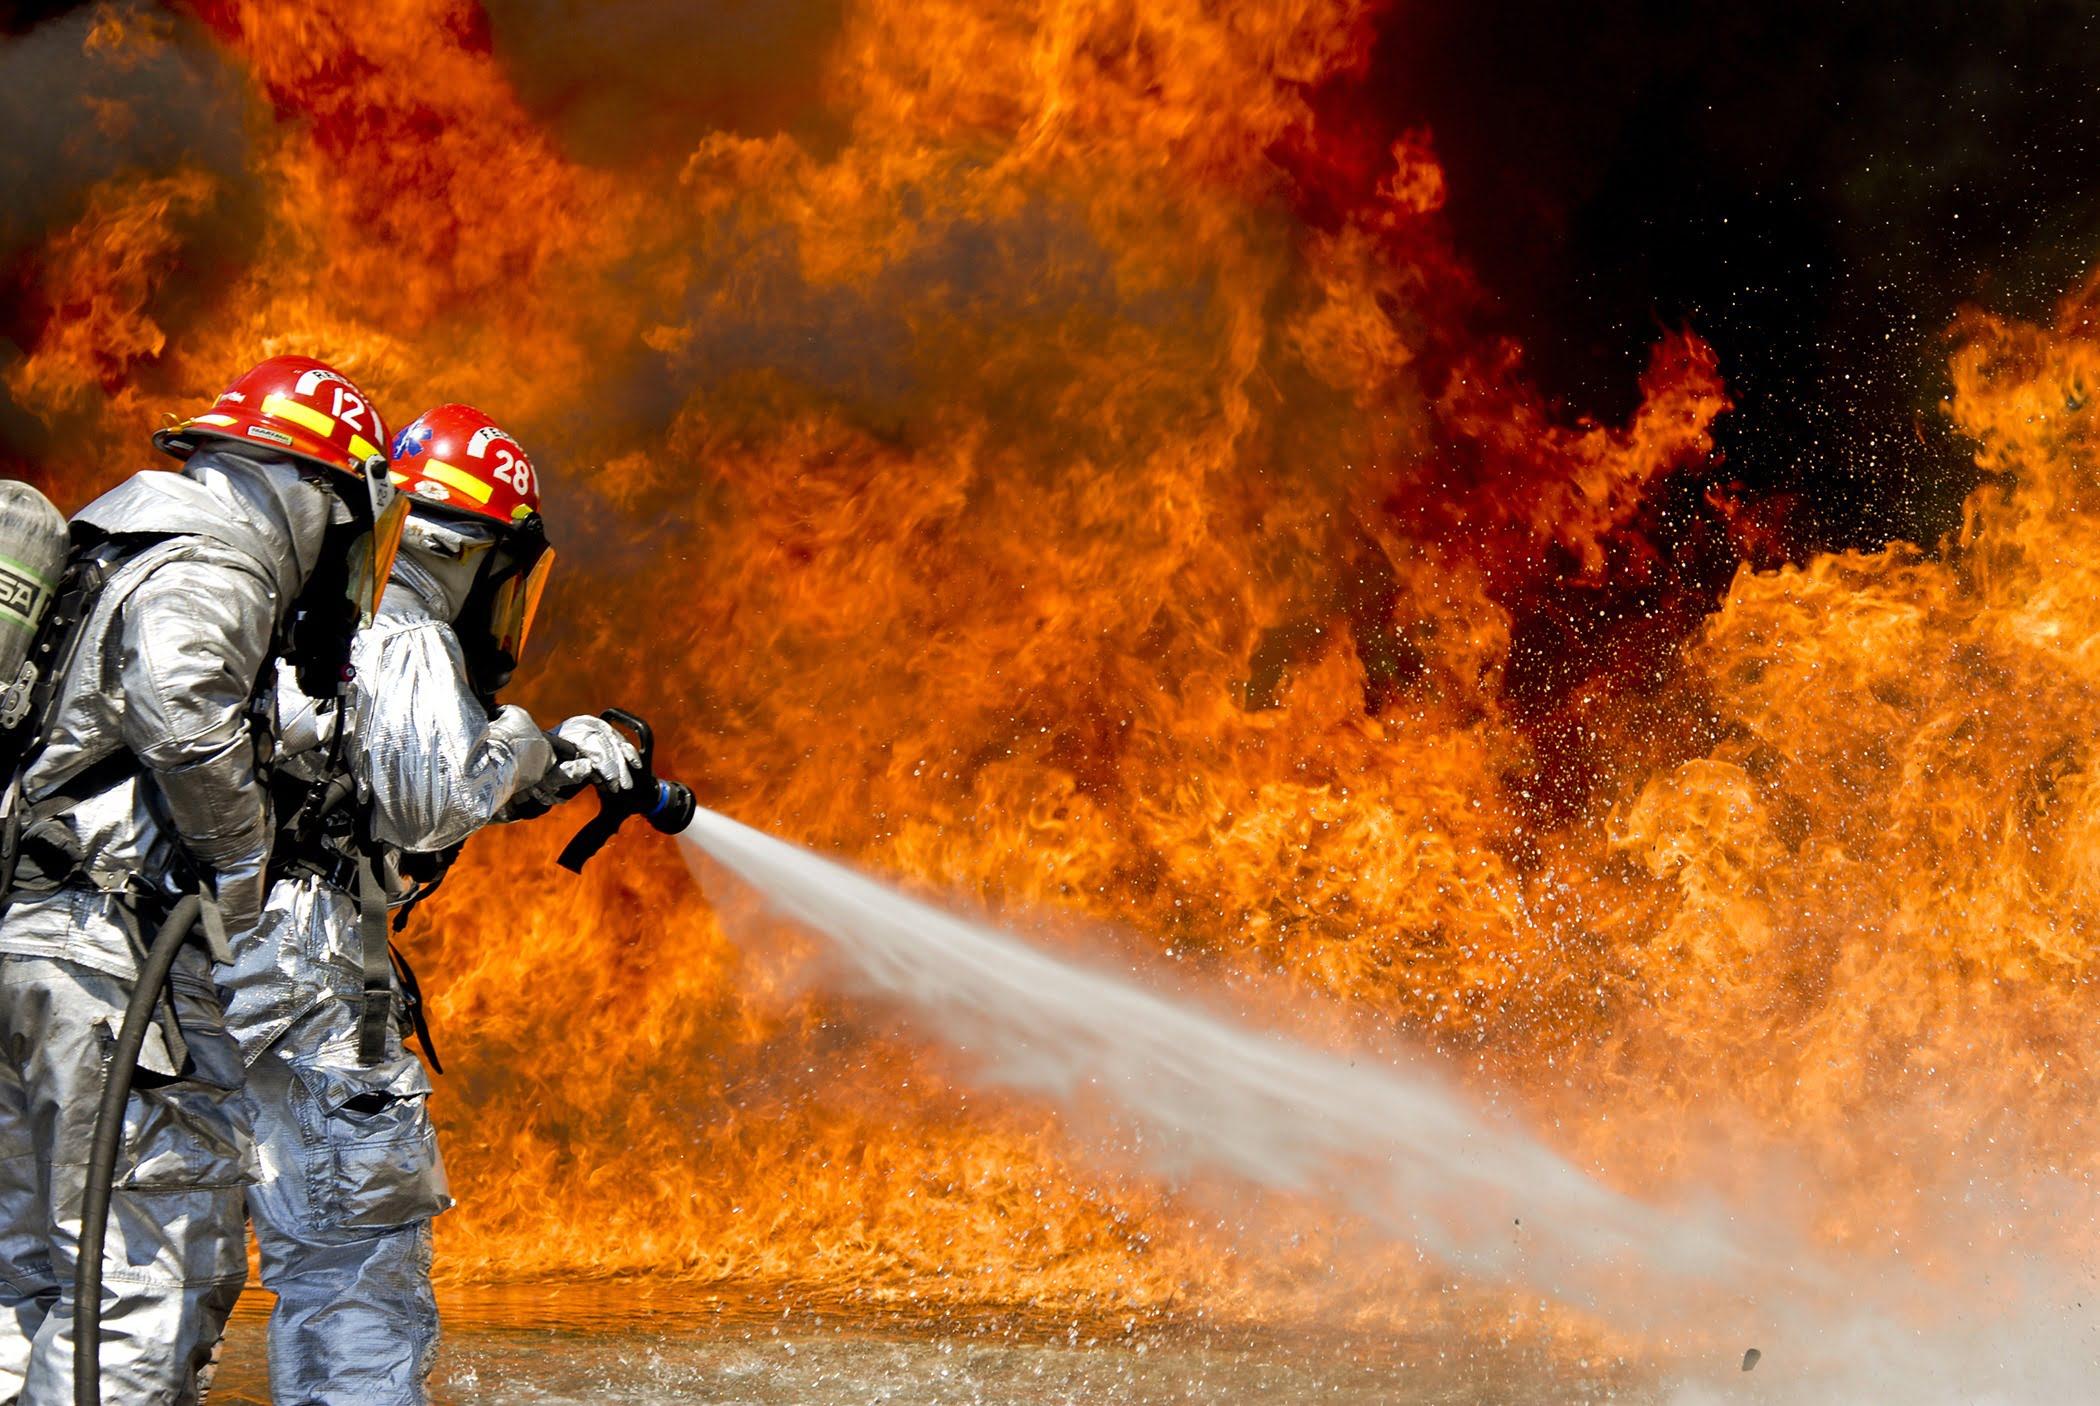 water outside fire hose 山上發現森林大火時,應該通知哪個單位?聯絡電話多少?